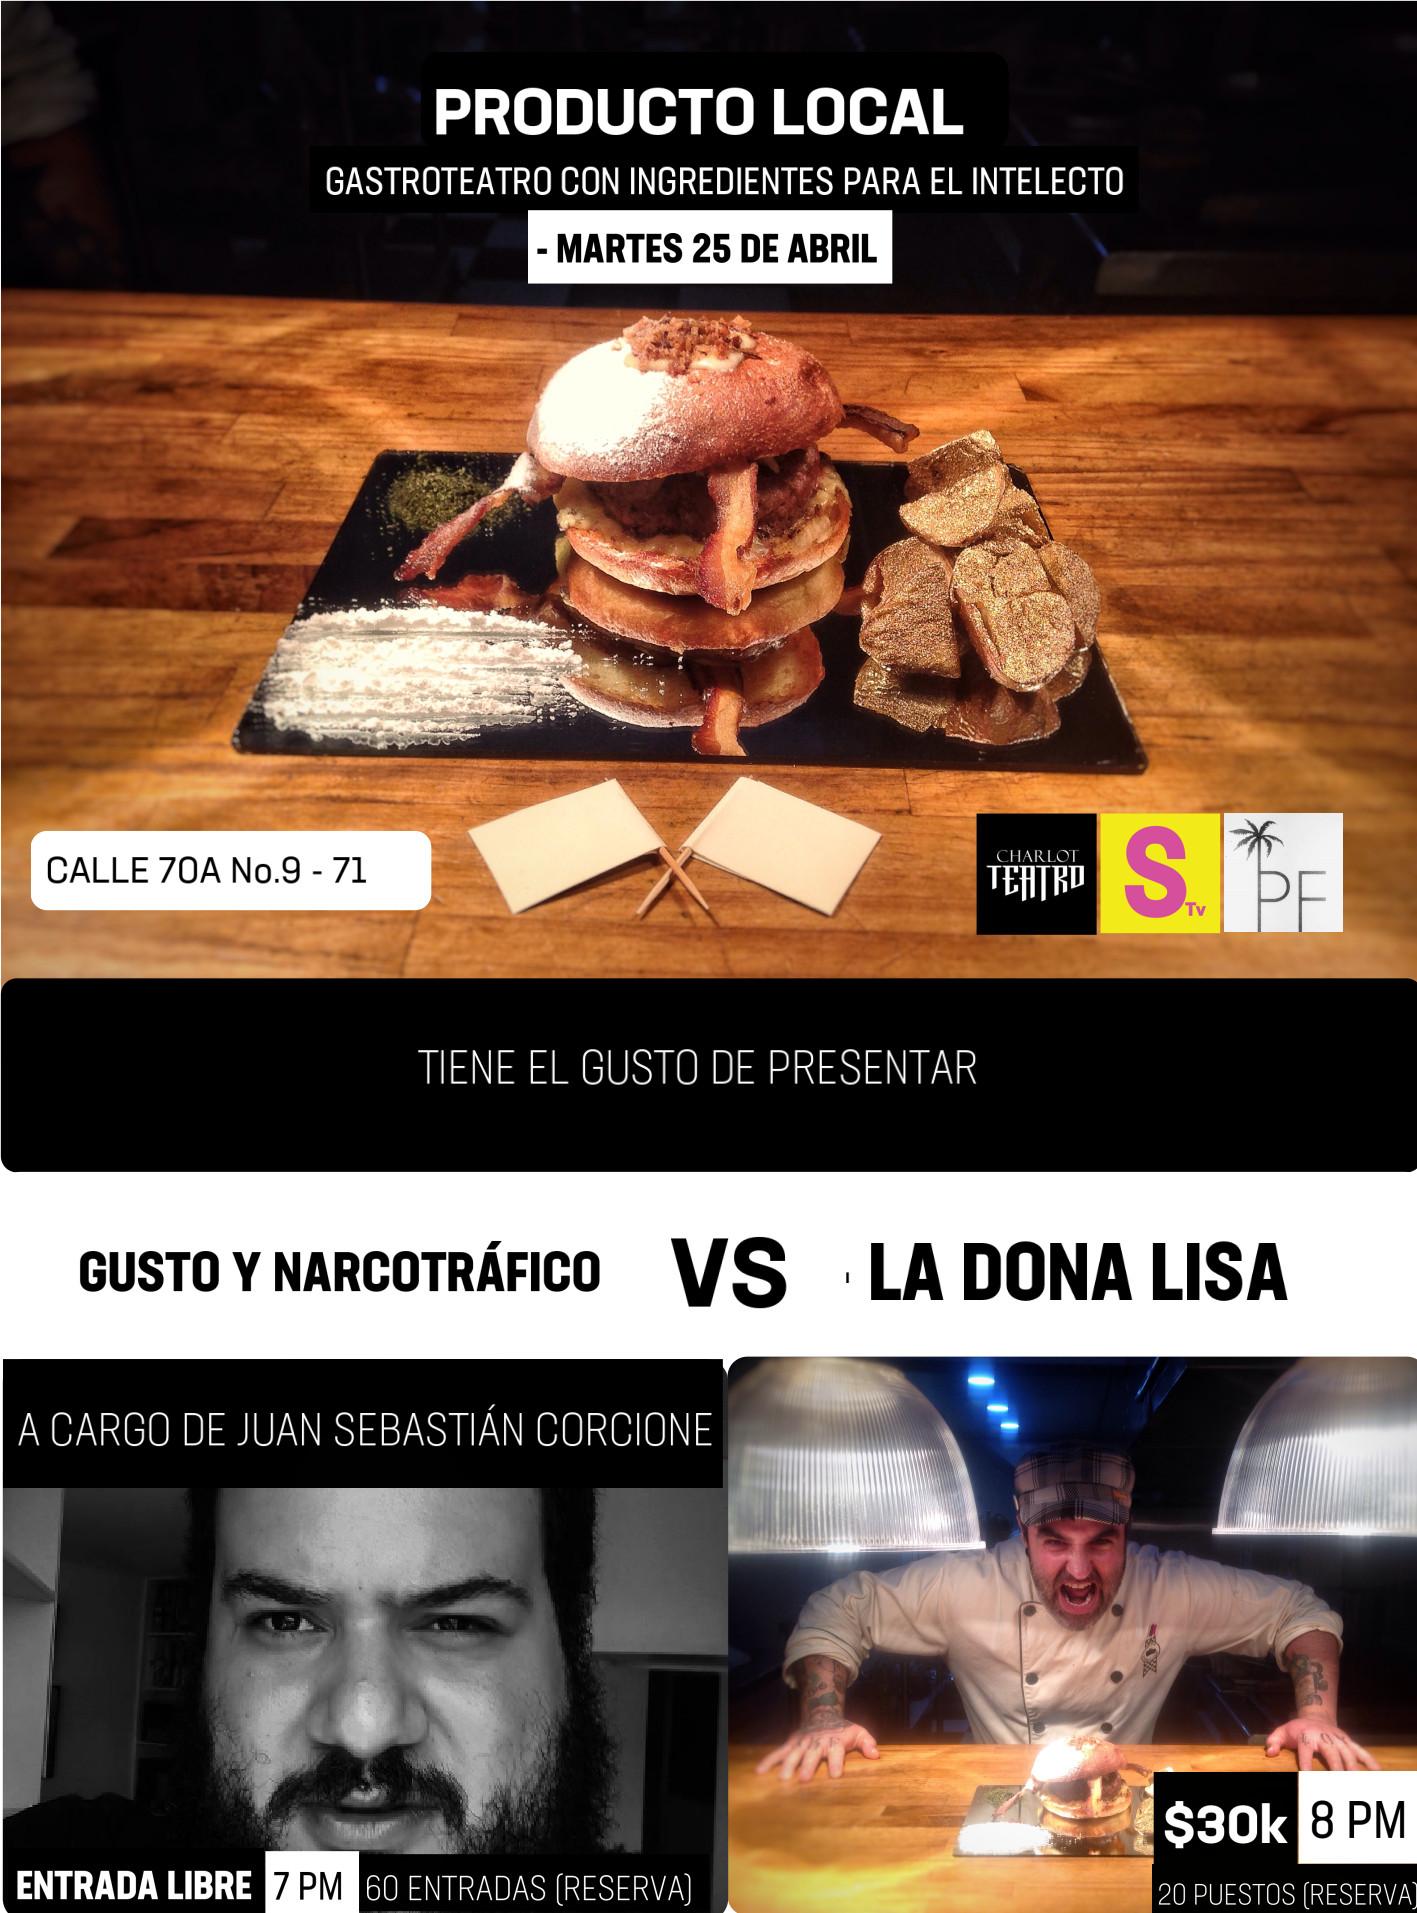 PRODUCTO LOCAL 1 - LA DONALISA